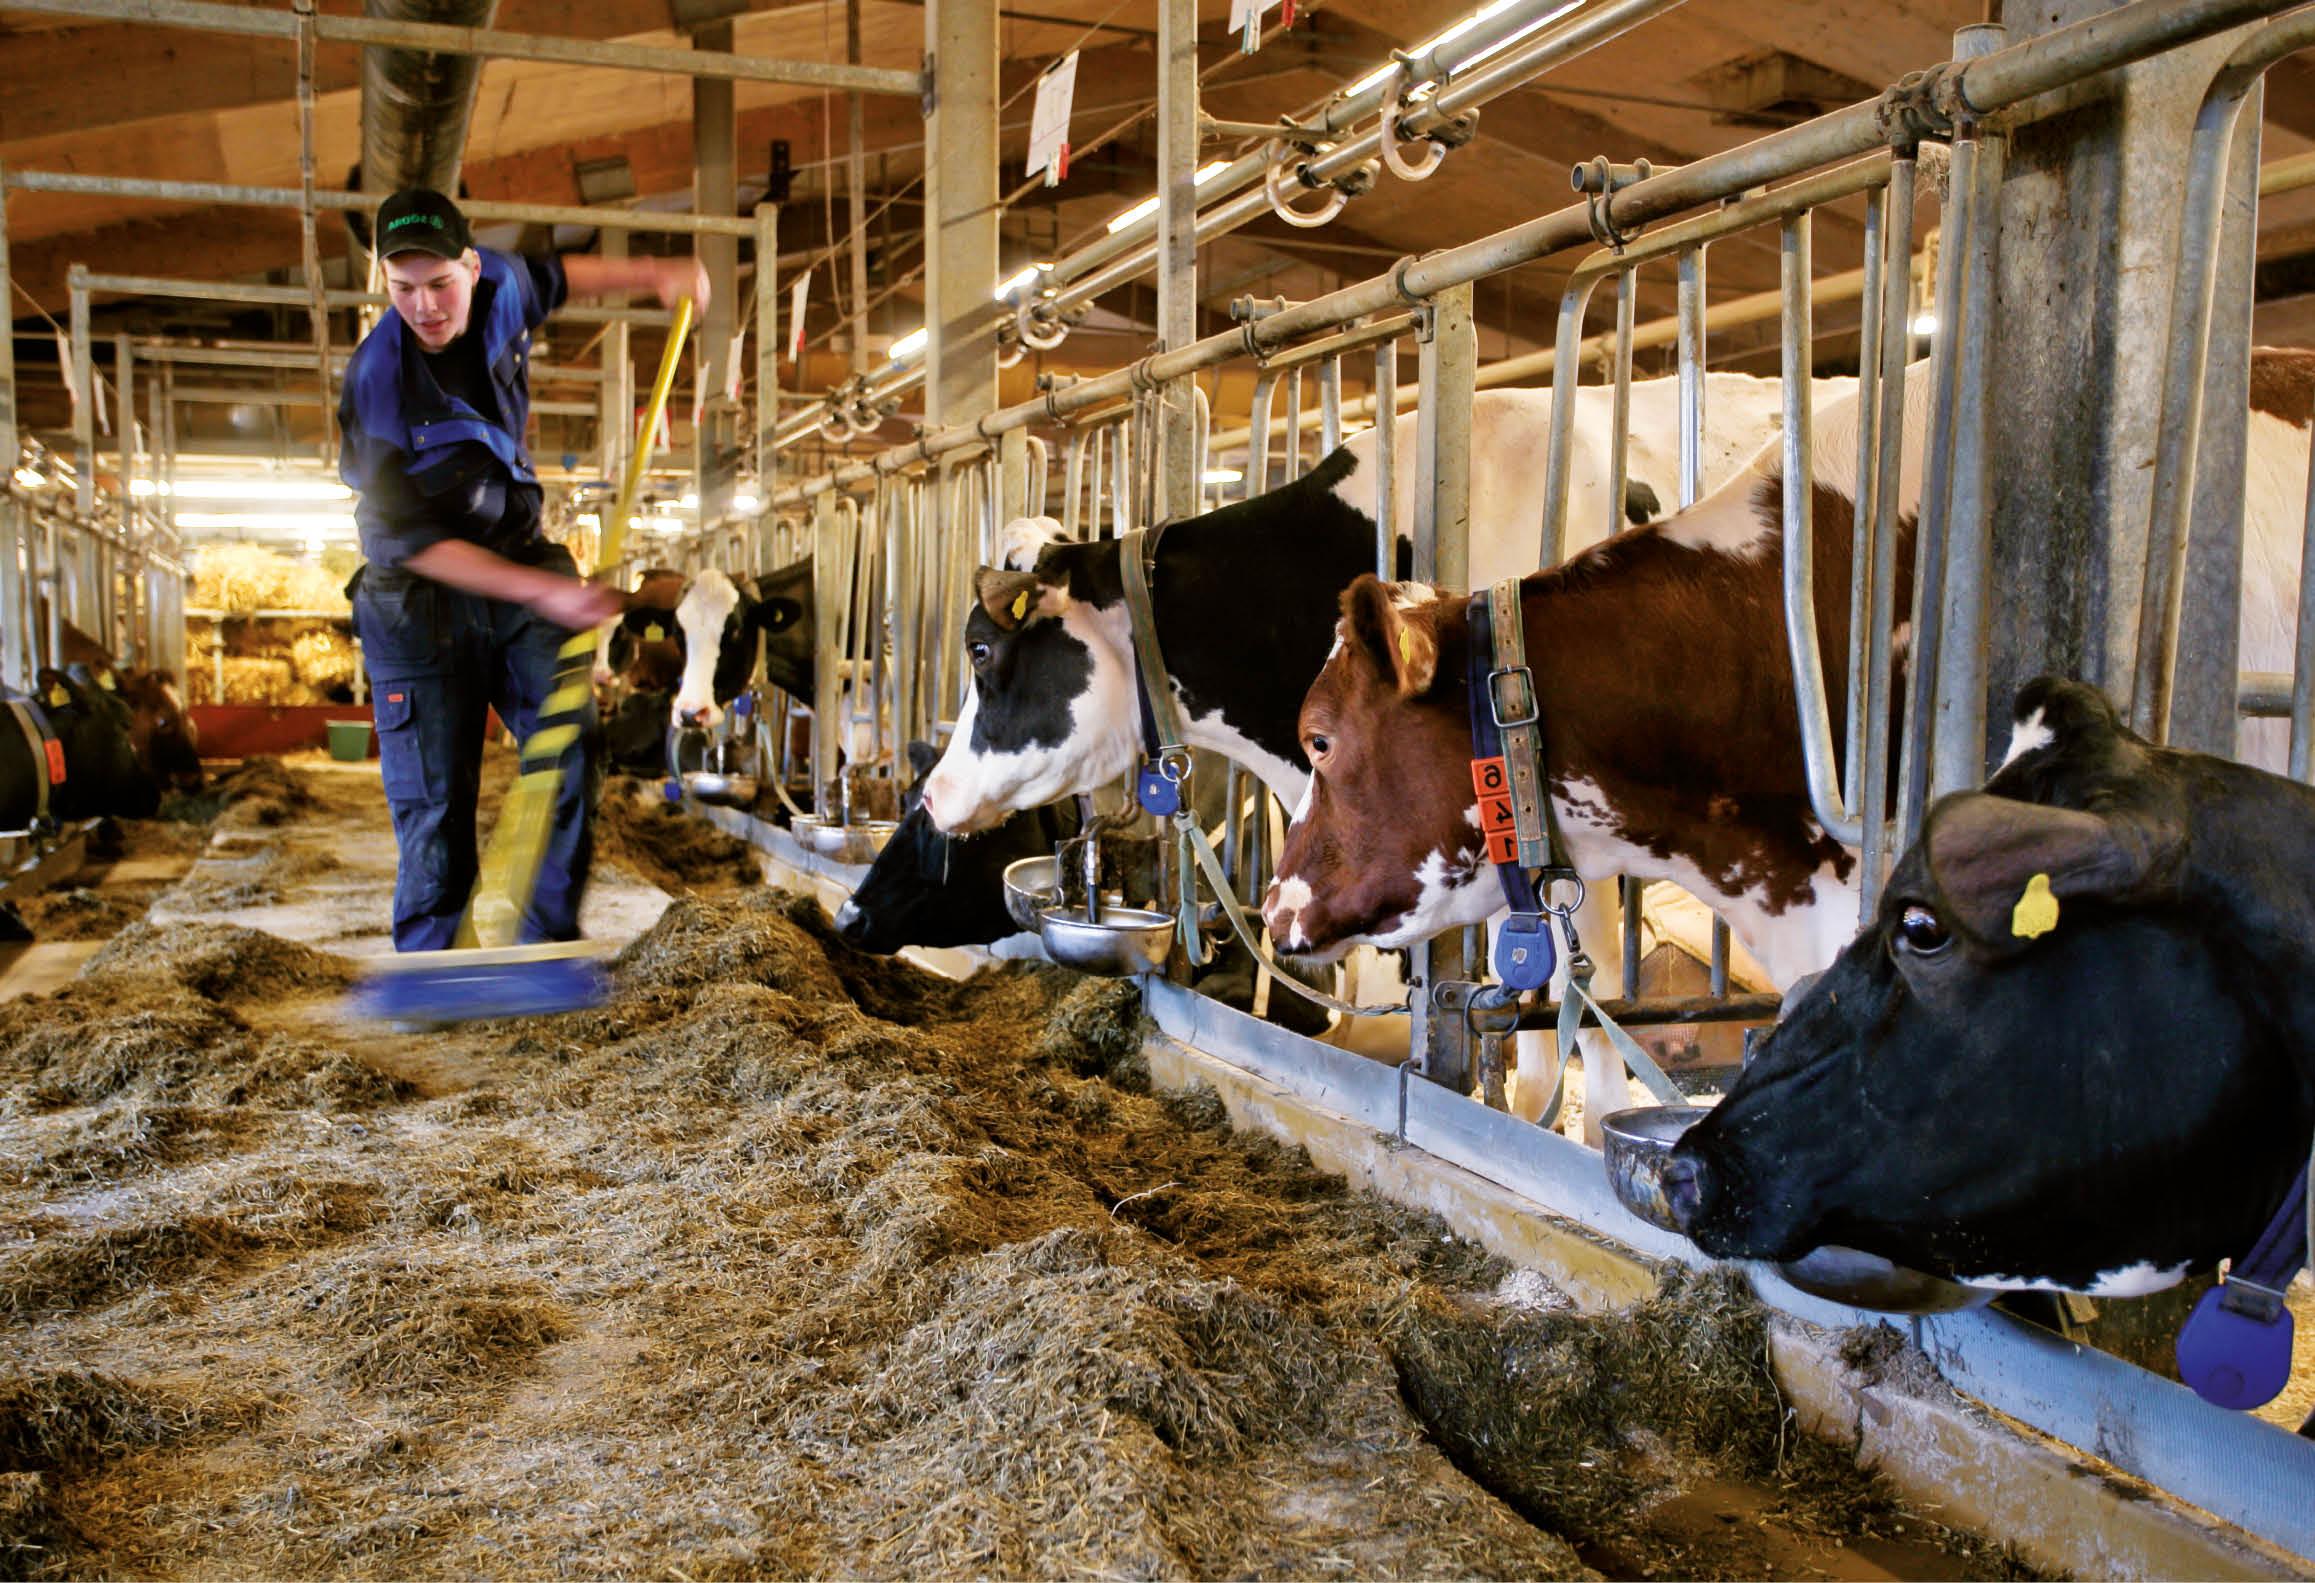 Lantbrukare utfodrar kor i ladugård